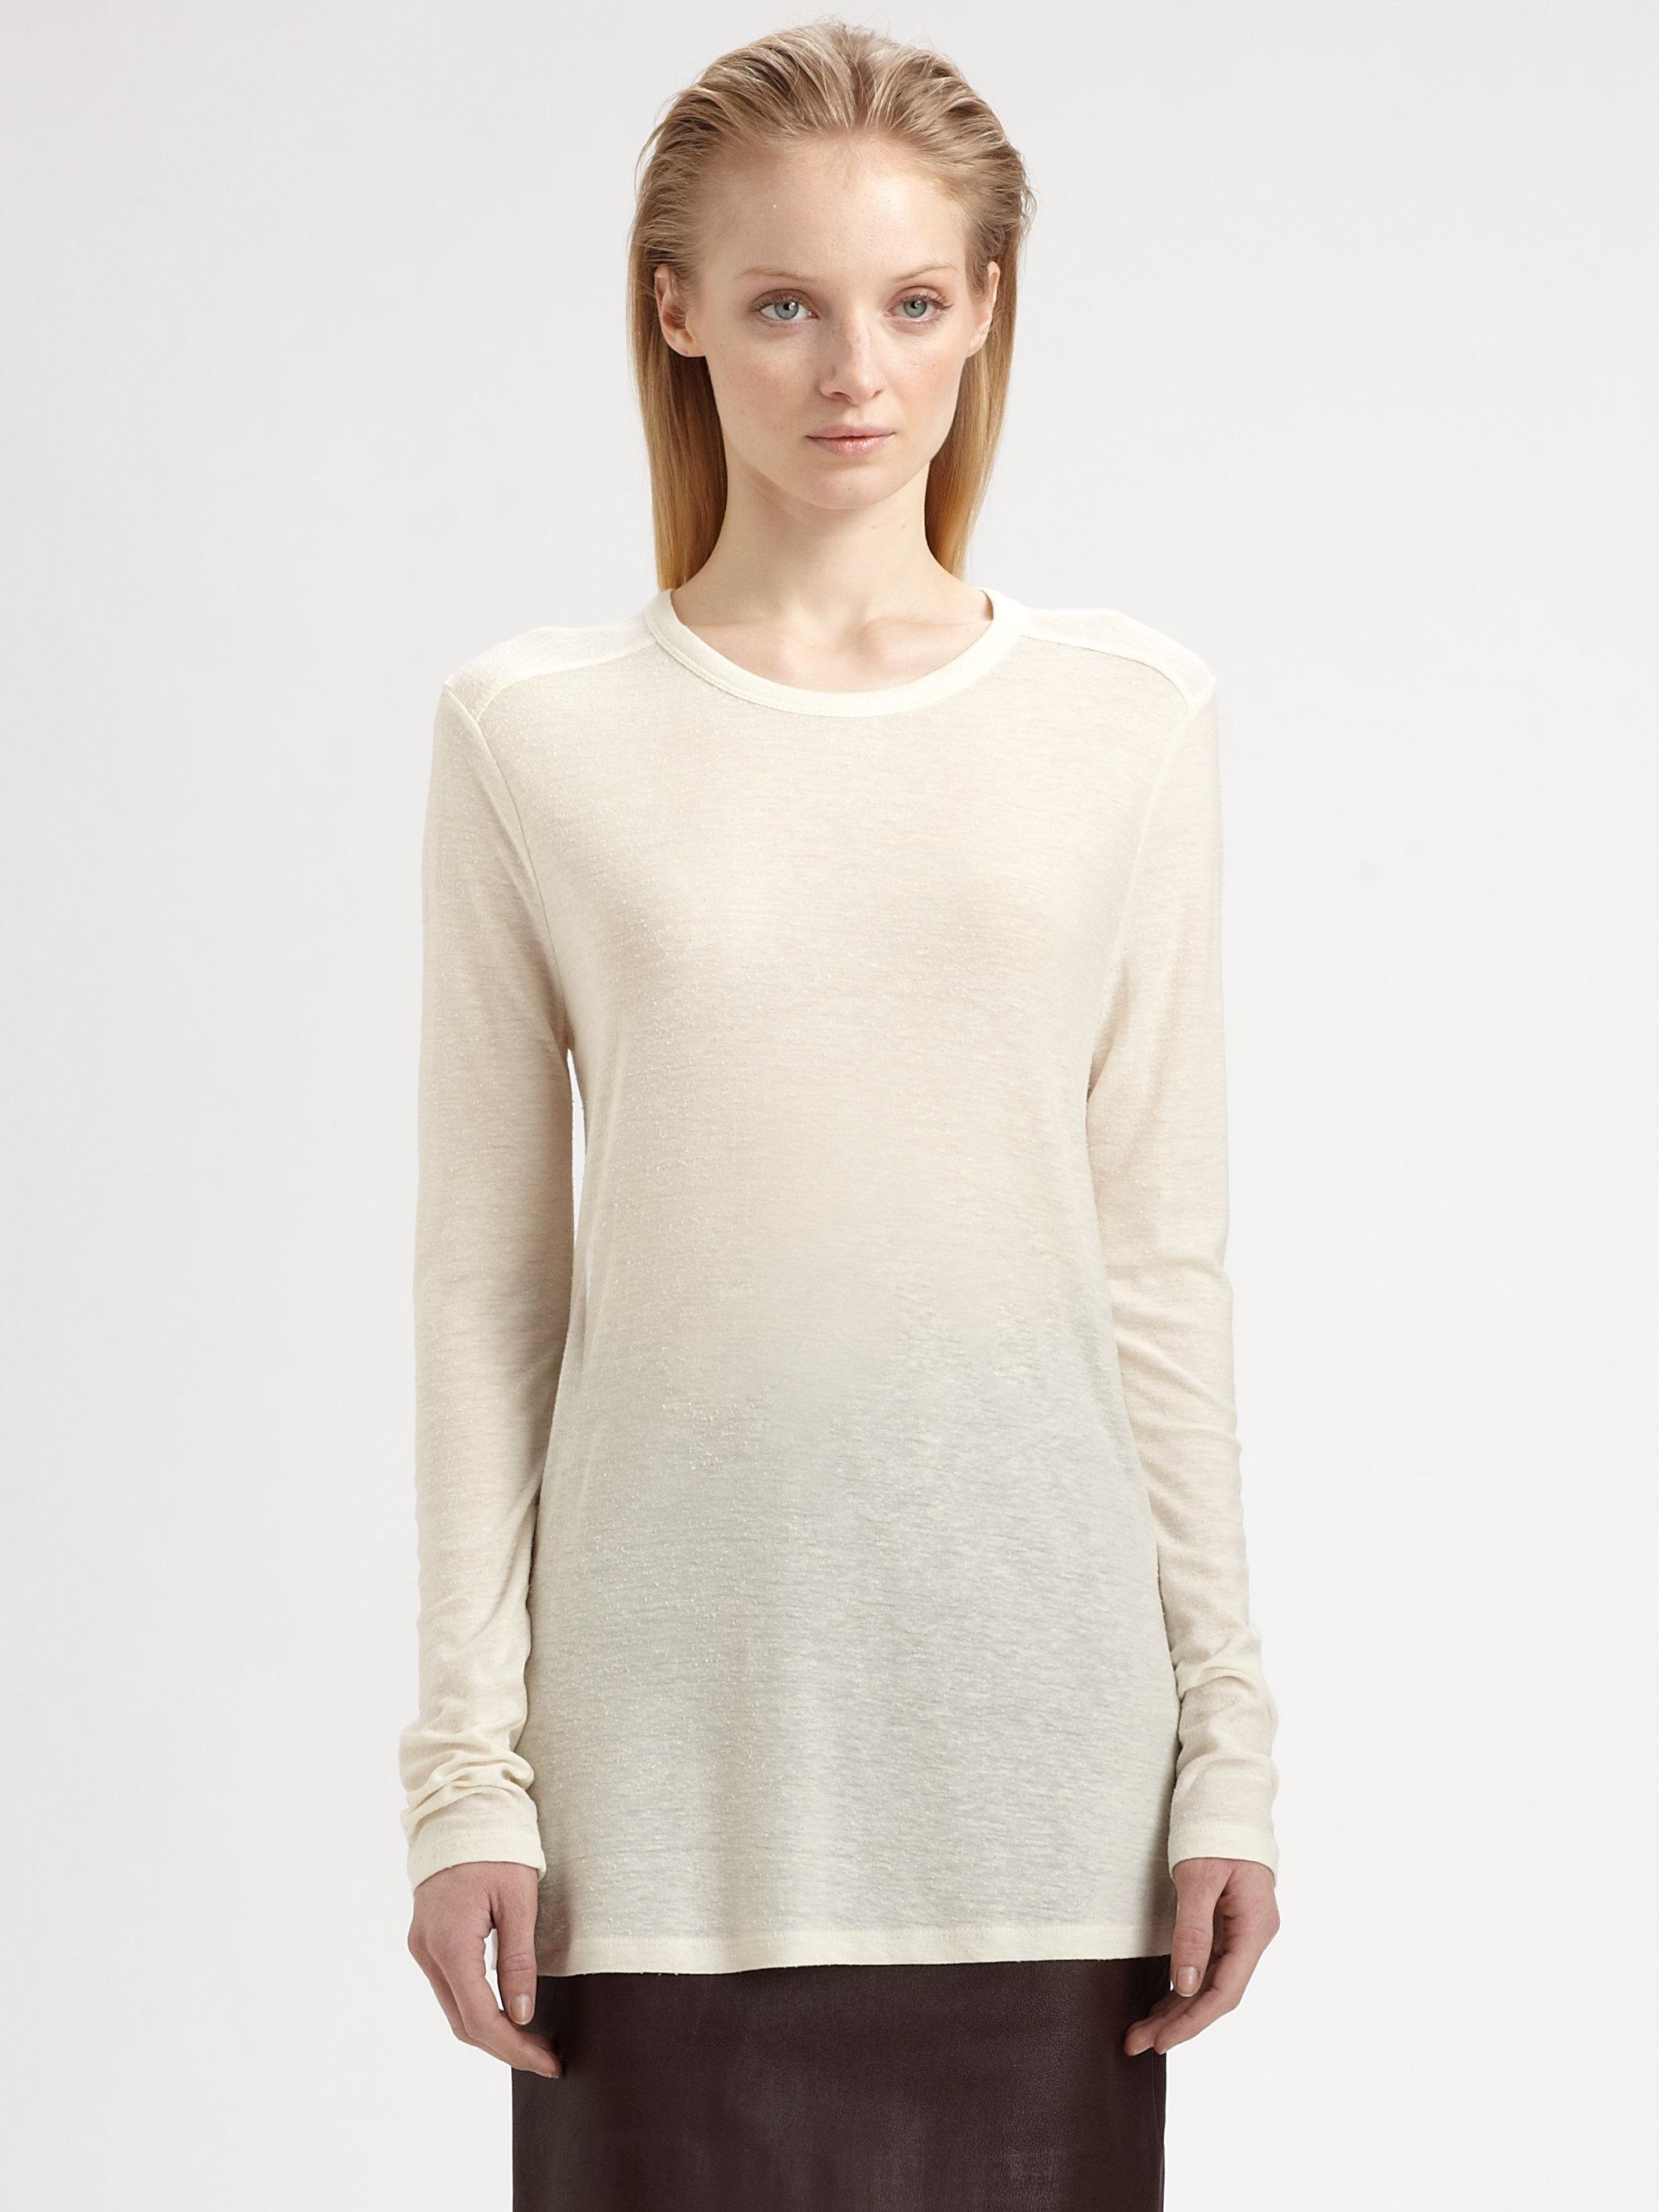 T by alexander wang classic slub long sleeve tee in white for Alexander wang t shirt women